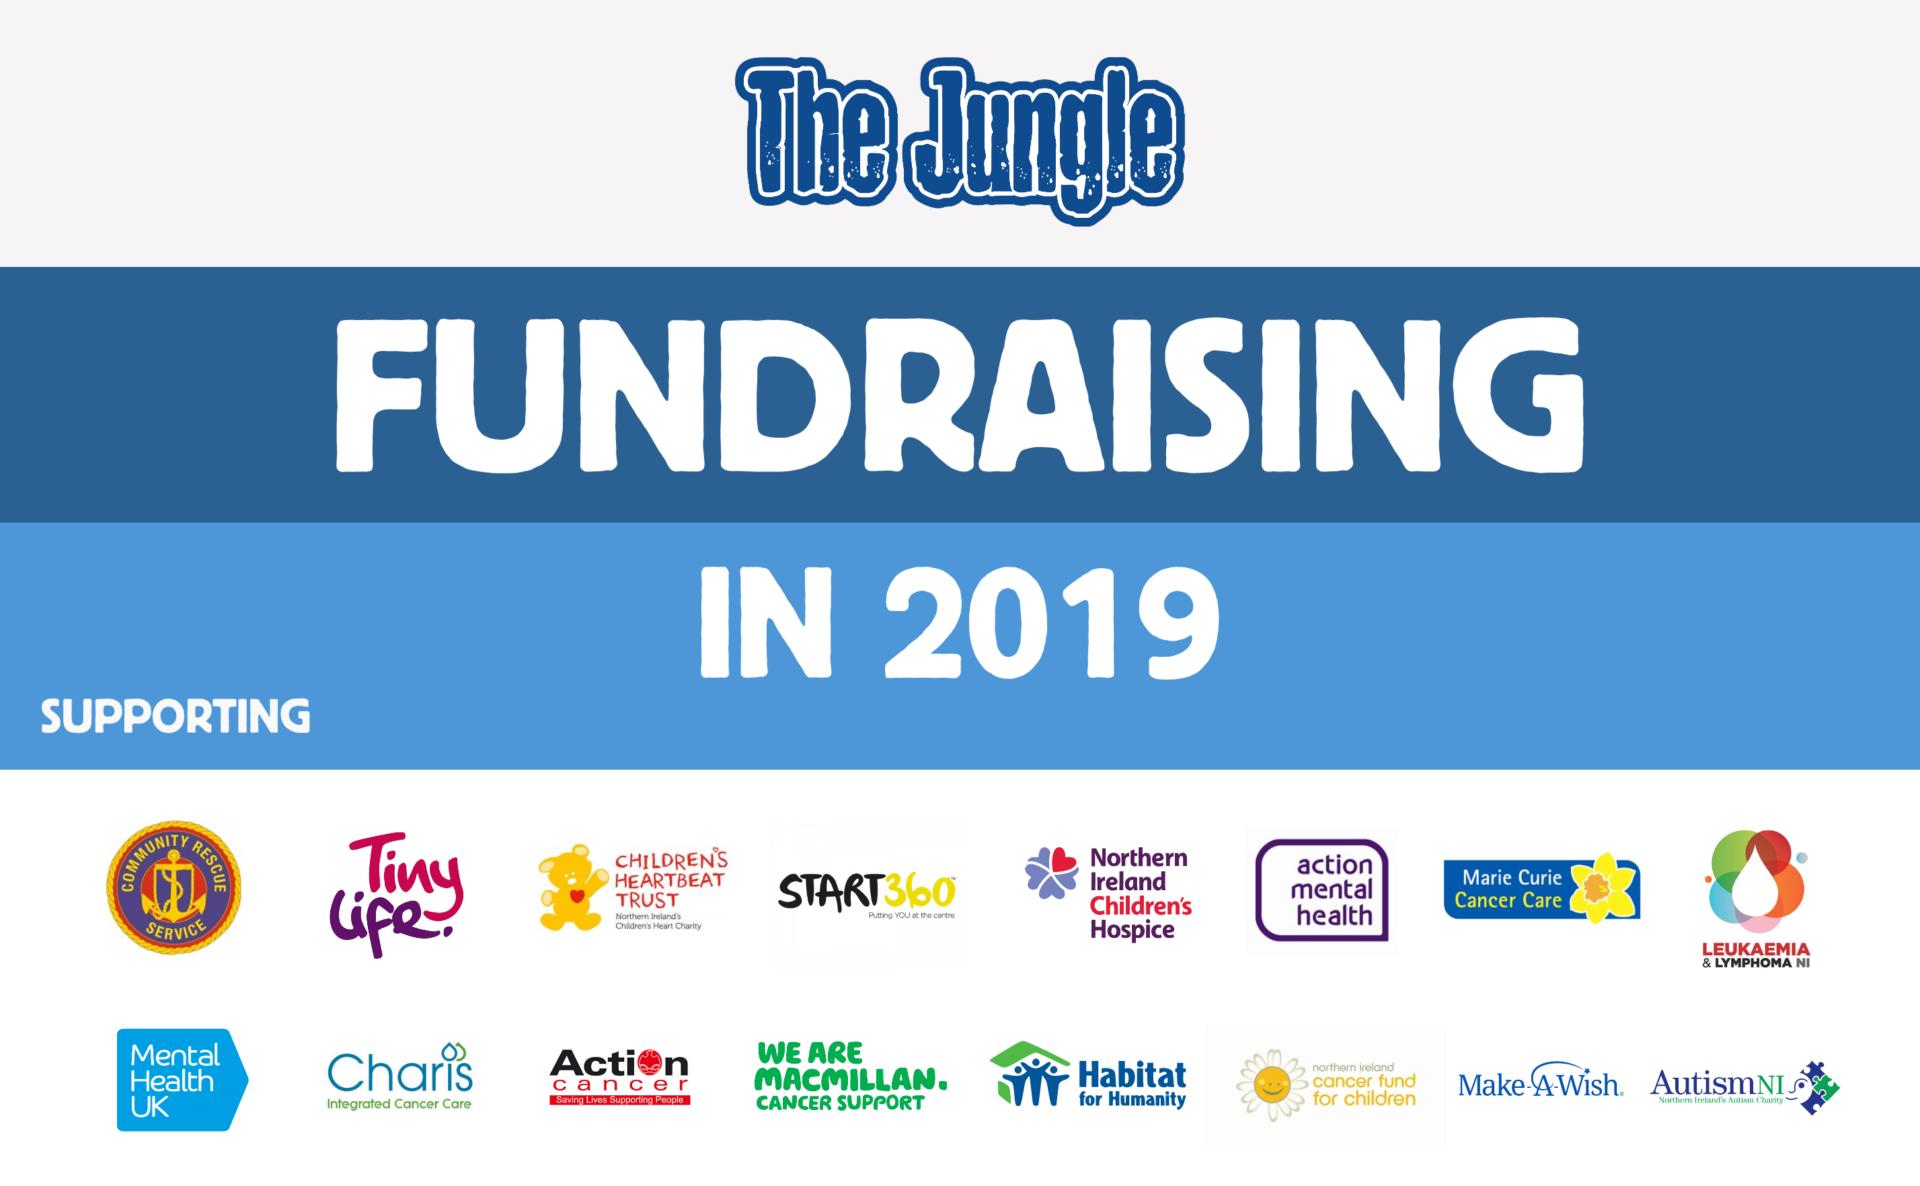 Jungle Fundraising 2019 logo image for FB